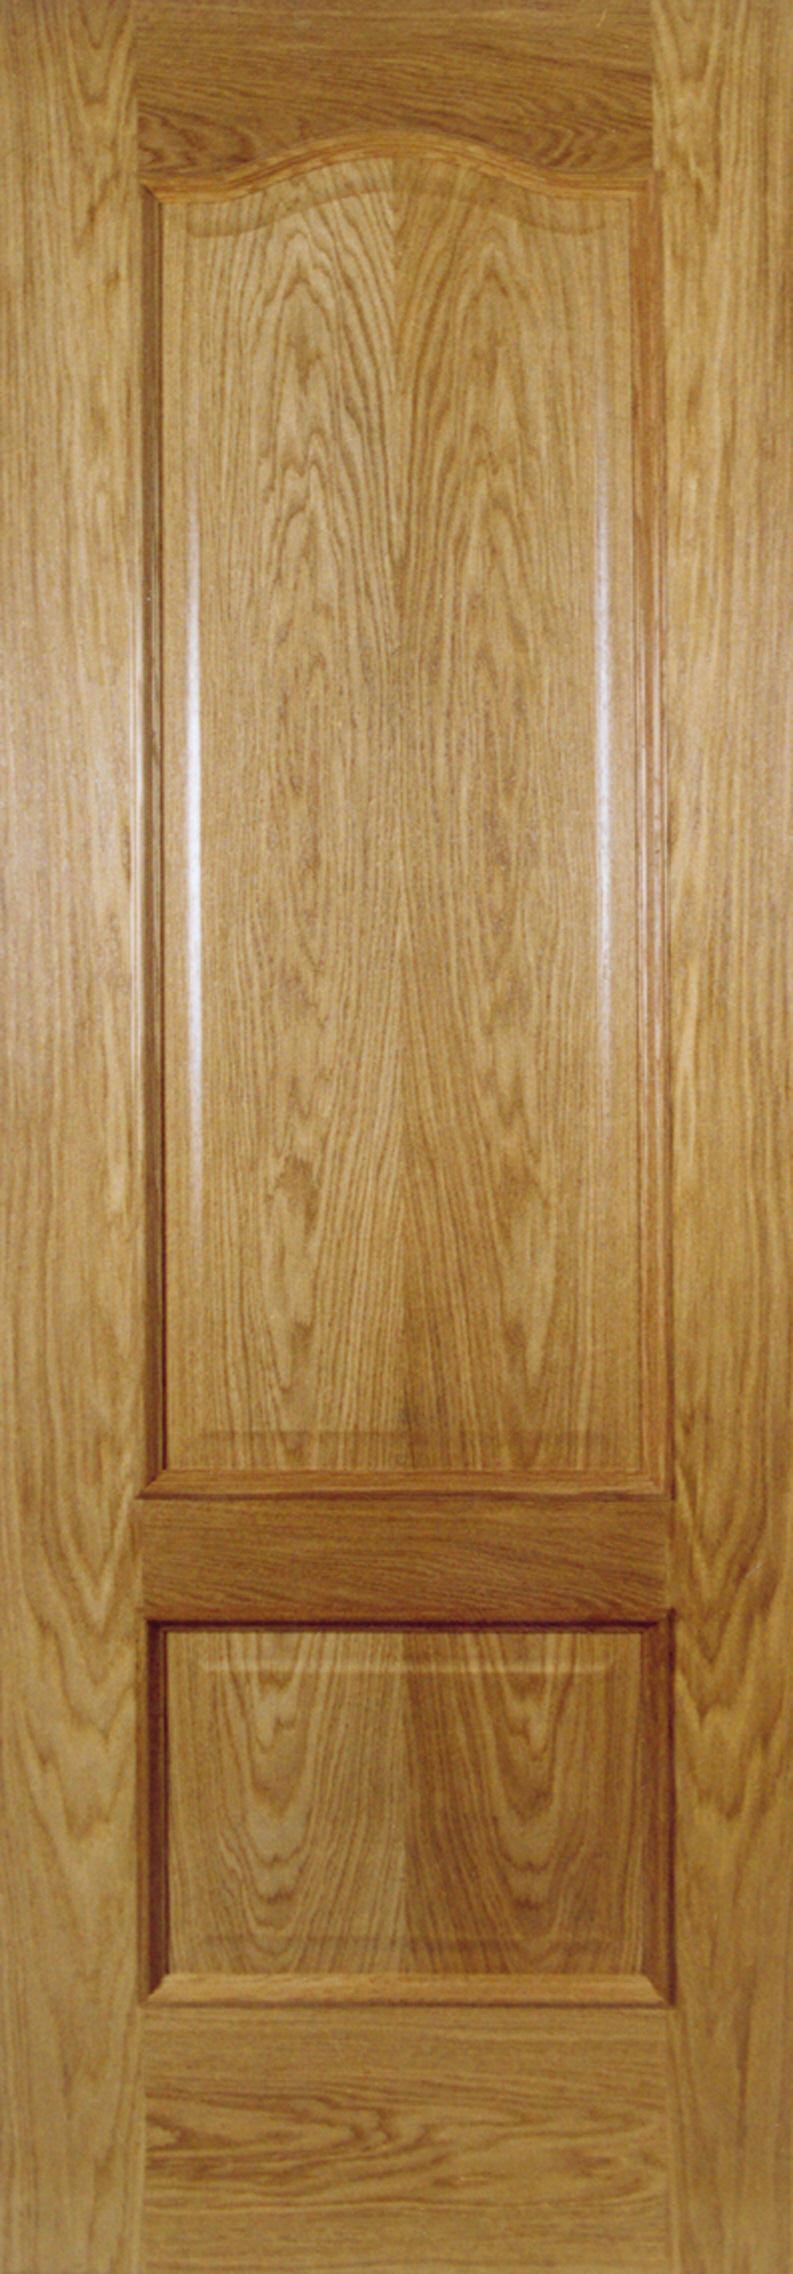 24 X 78 Kent Bolection Oak Door